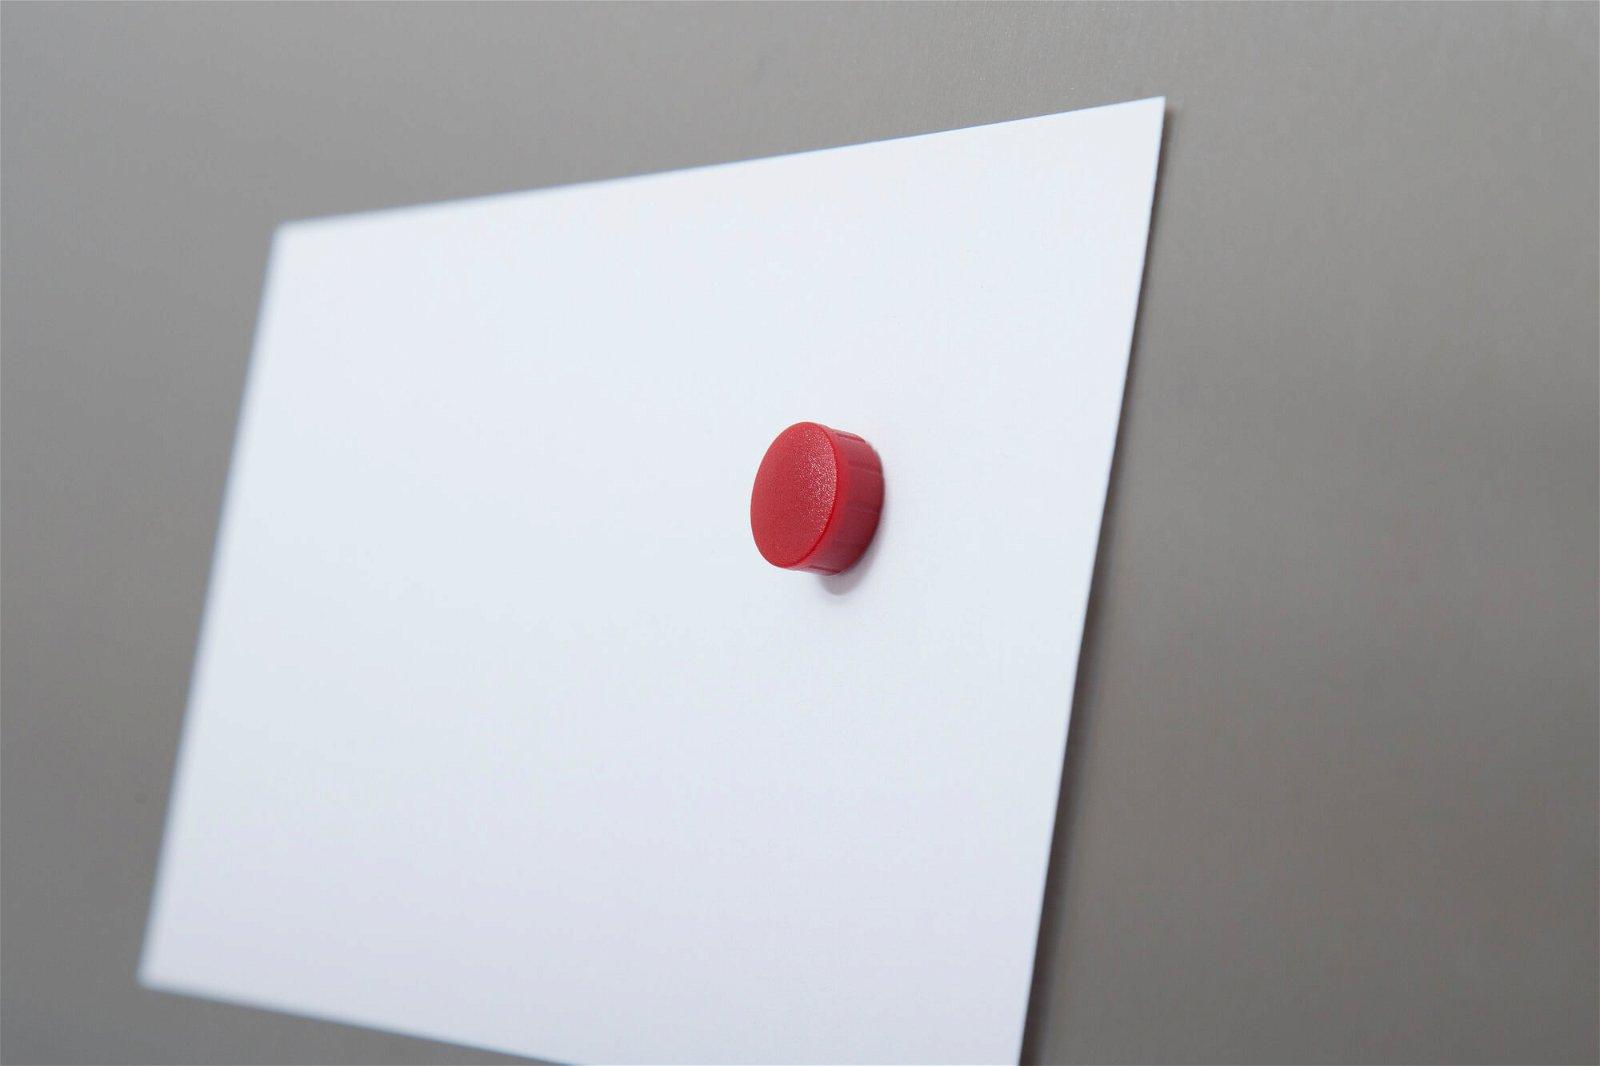 Magnet MAULsolid Ø 15 mm, 0,15 kg Haftkraft, 10 St/Ktn., rot